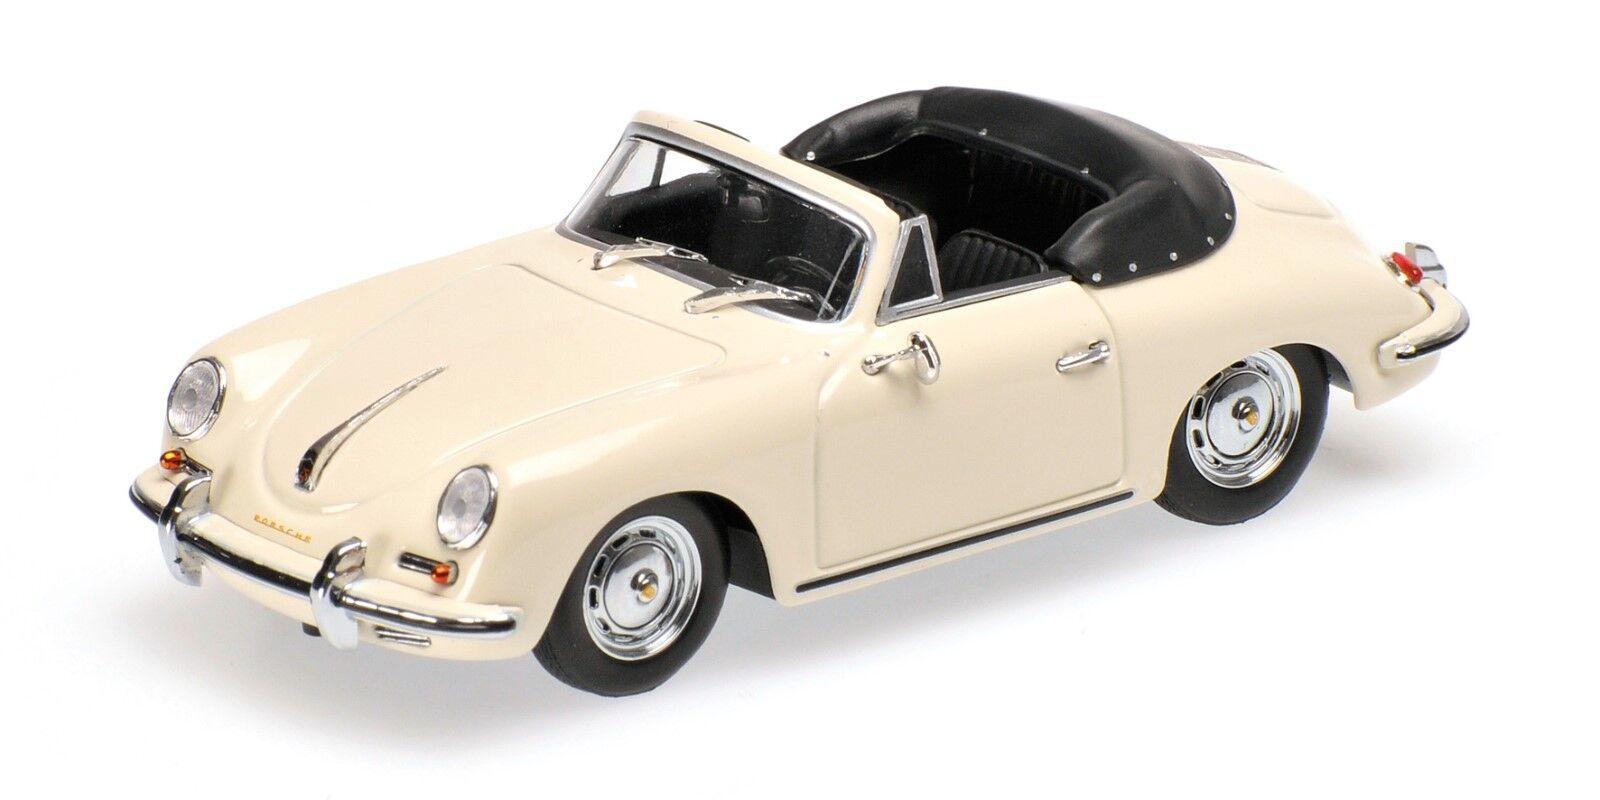 Minichamps  porsche 356 B Cabriolet  1960  OVP  1 43  IVOIRE  berline 252